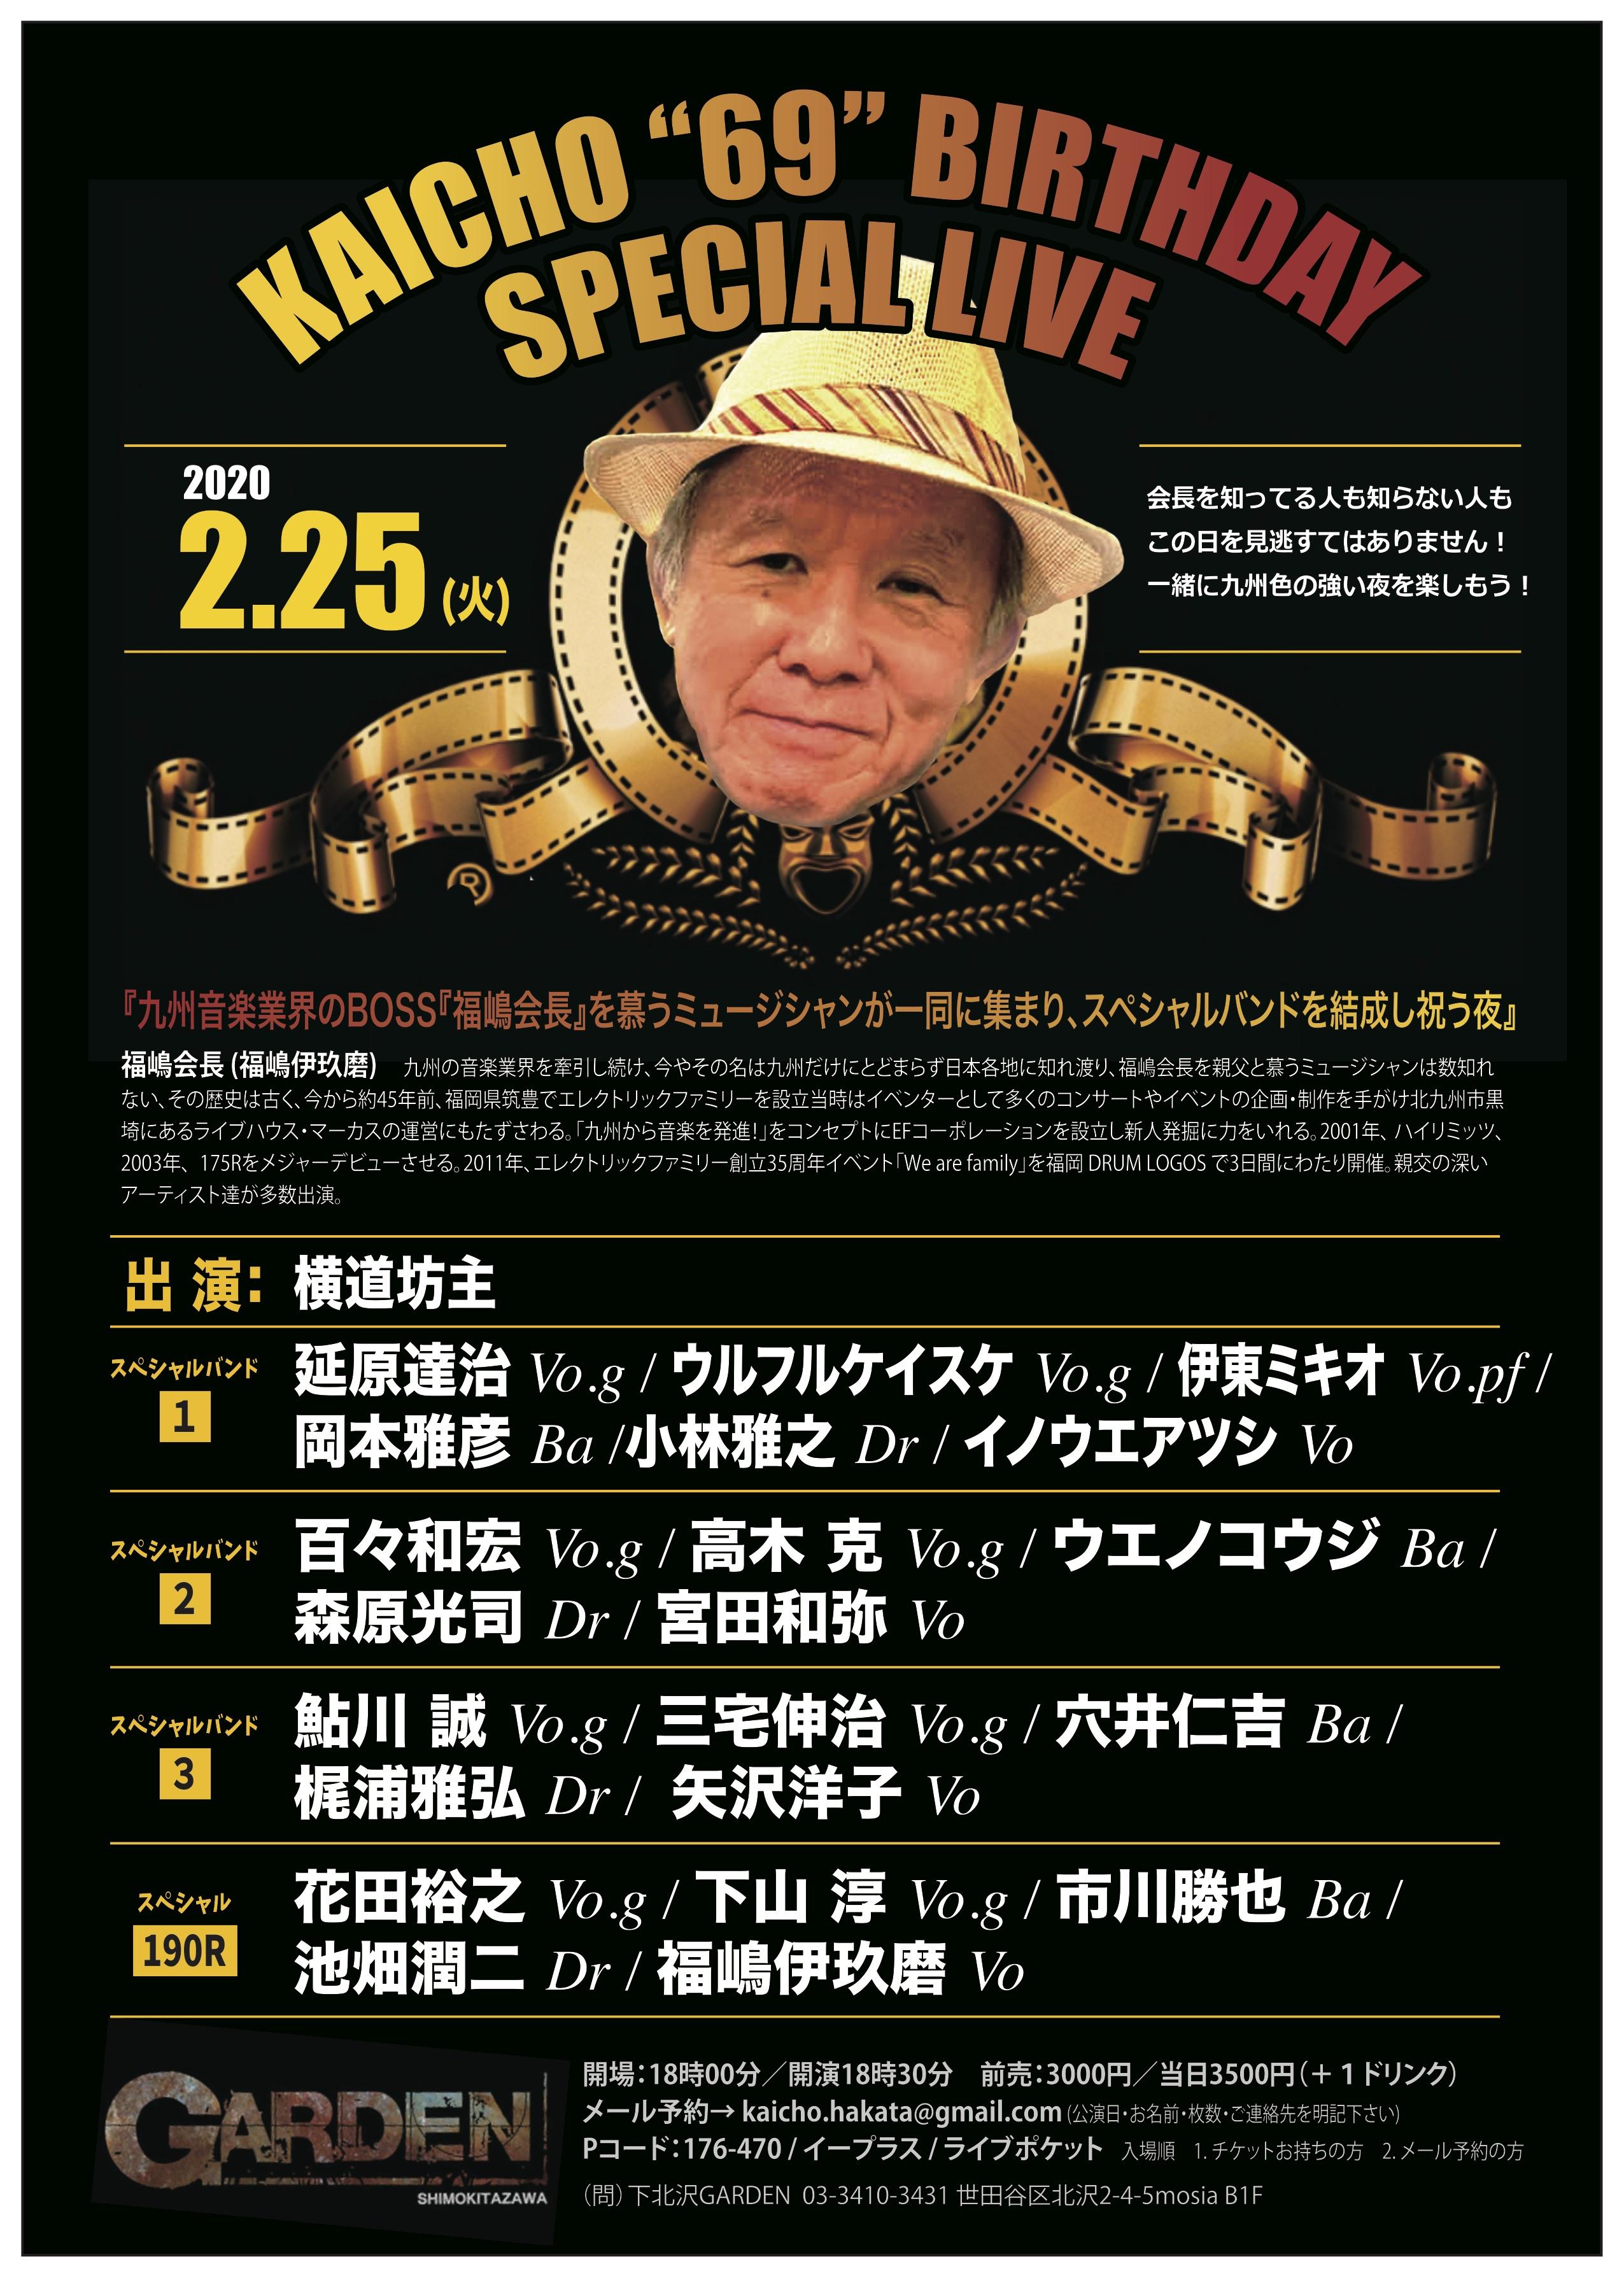 "〜KAICHO""69""BIRTHDAY SPECIAL LIVE〜『九州音楽業界のBOSS福嶋会長を慕うミュージシャンが一同に集まりスペシャルバンドを結成し祝う夜』"